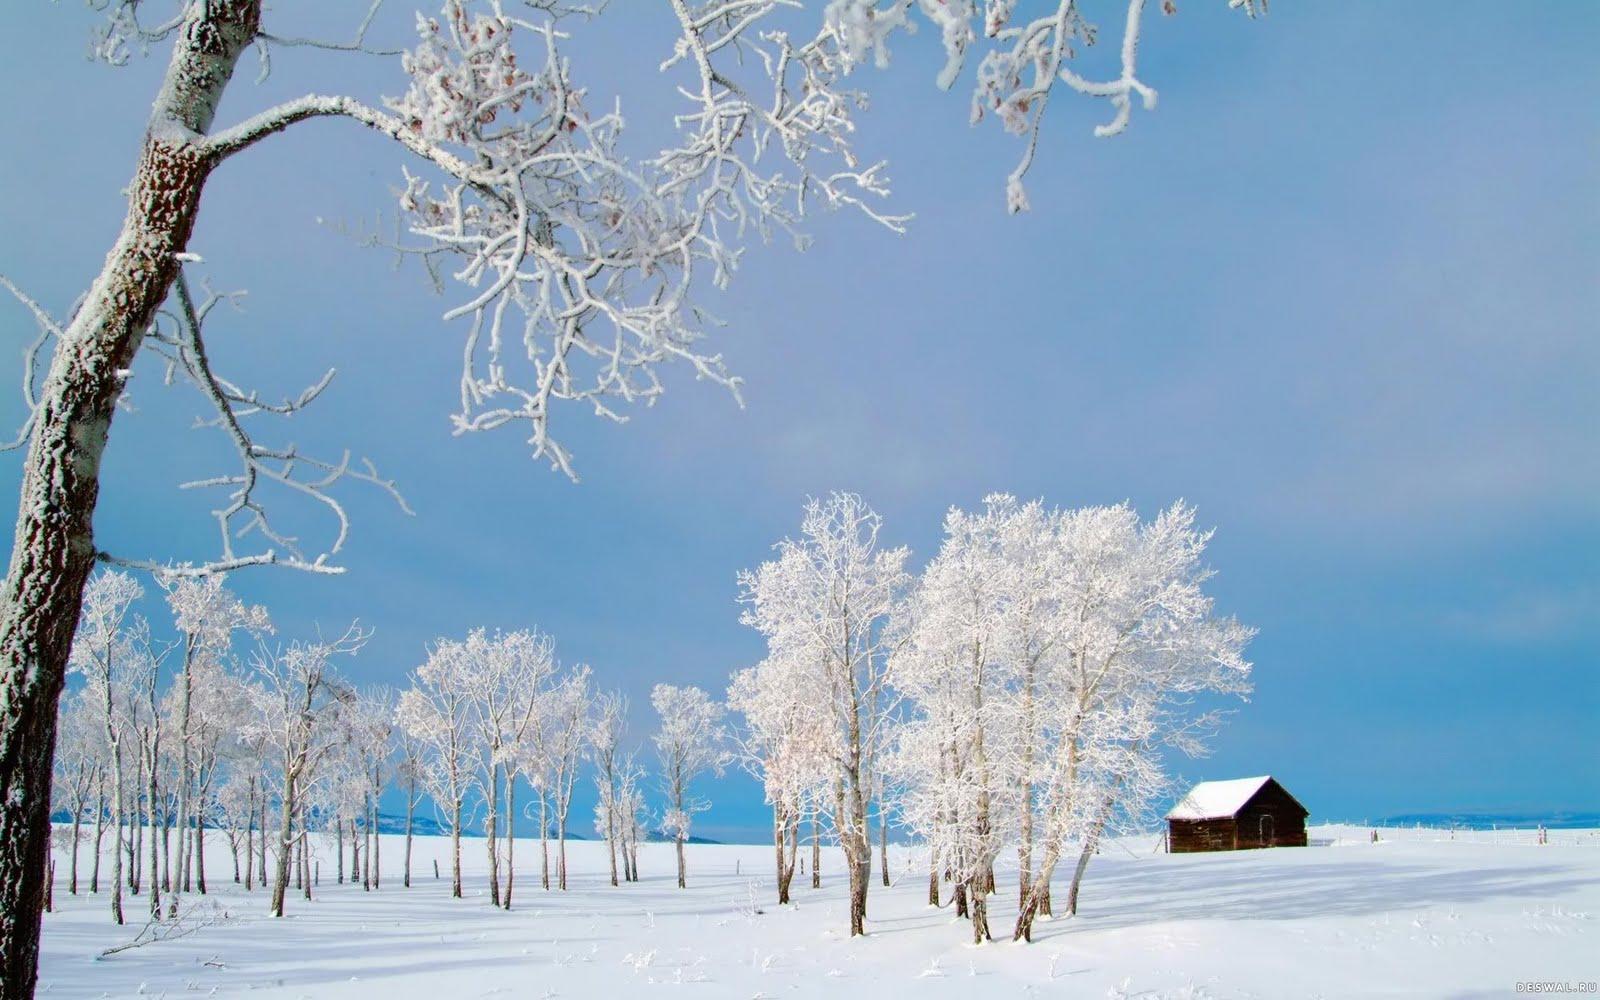 Winter House hunting hd wallpaper - Beauty O'v NaTuRe ....... !!!!!!!!